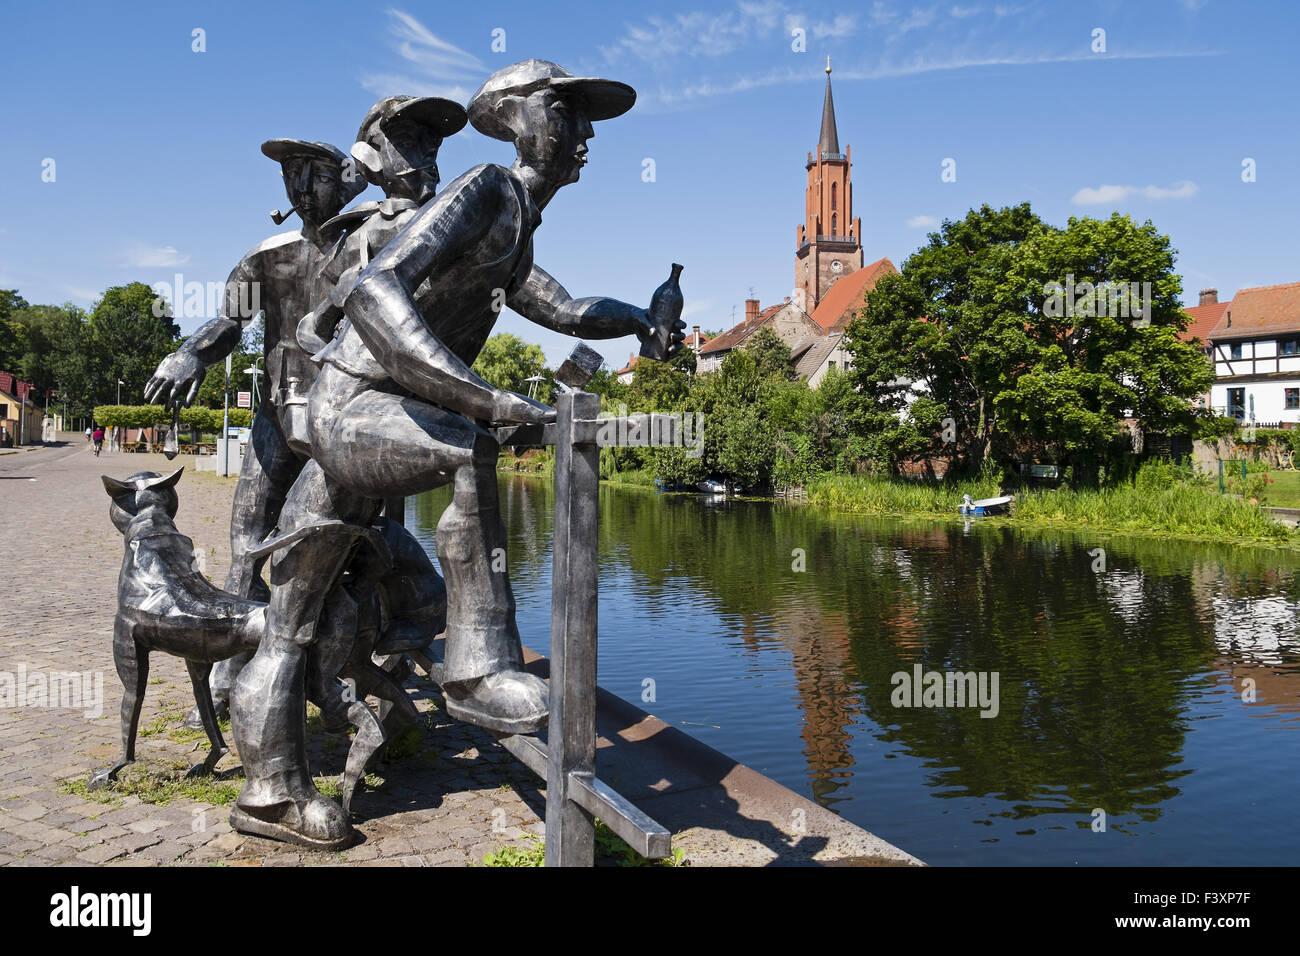 Sculpture Schleusenspucker, Rathenow, Germany Stock Photo